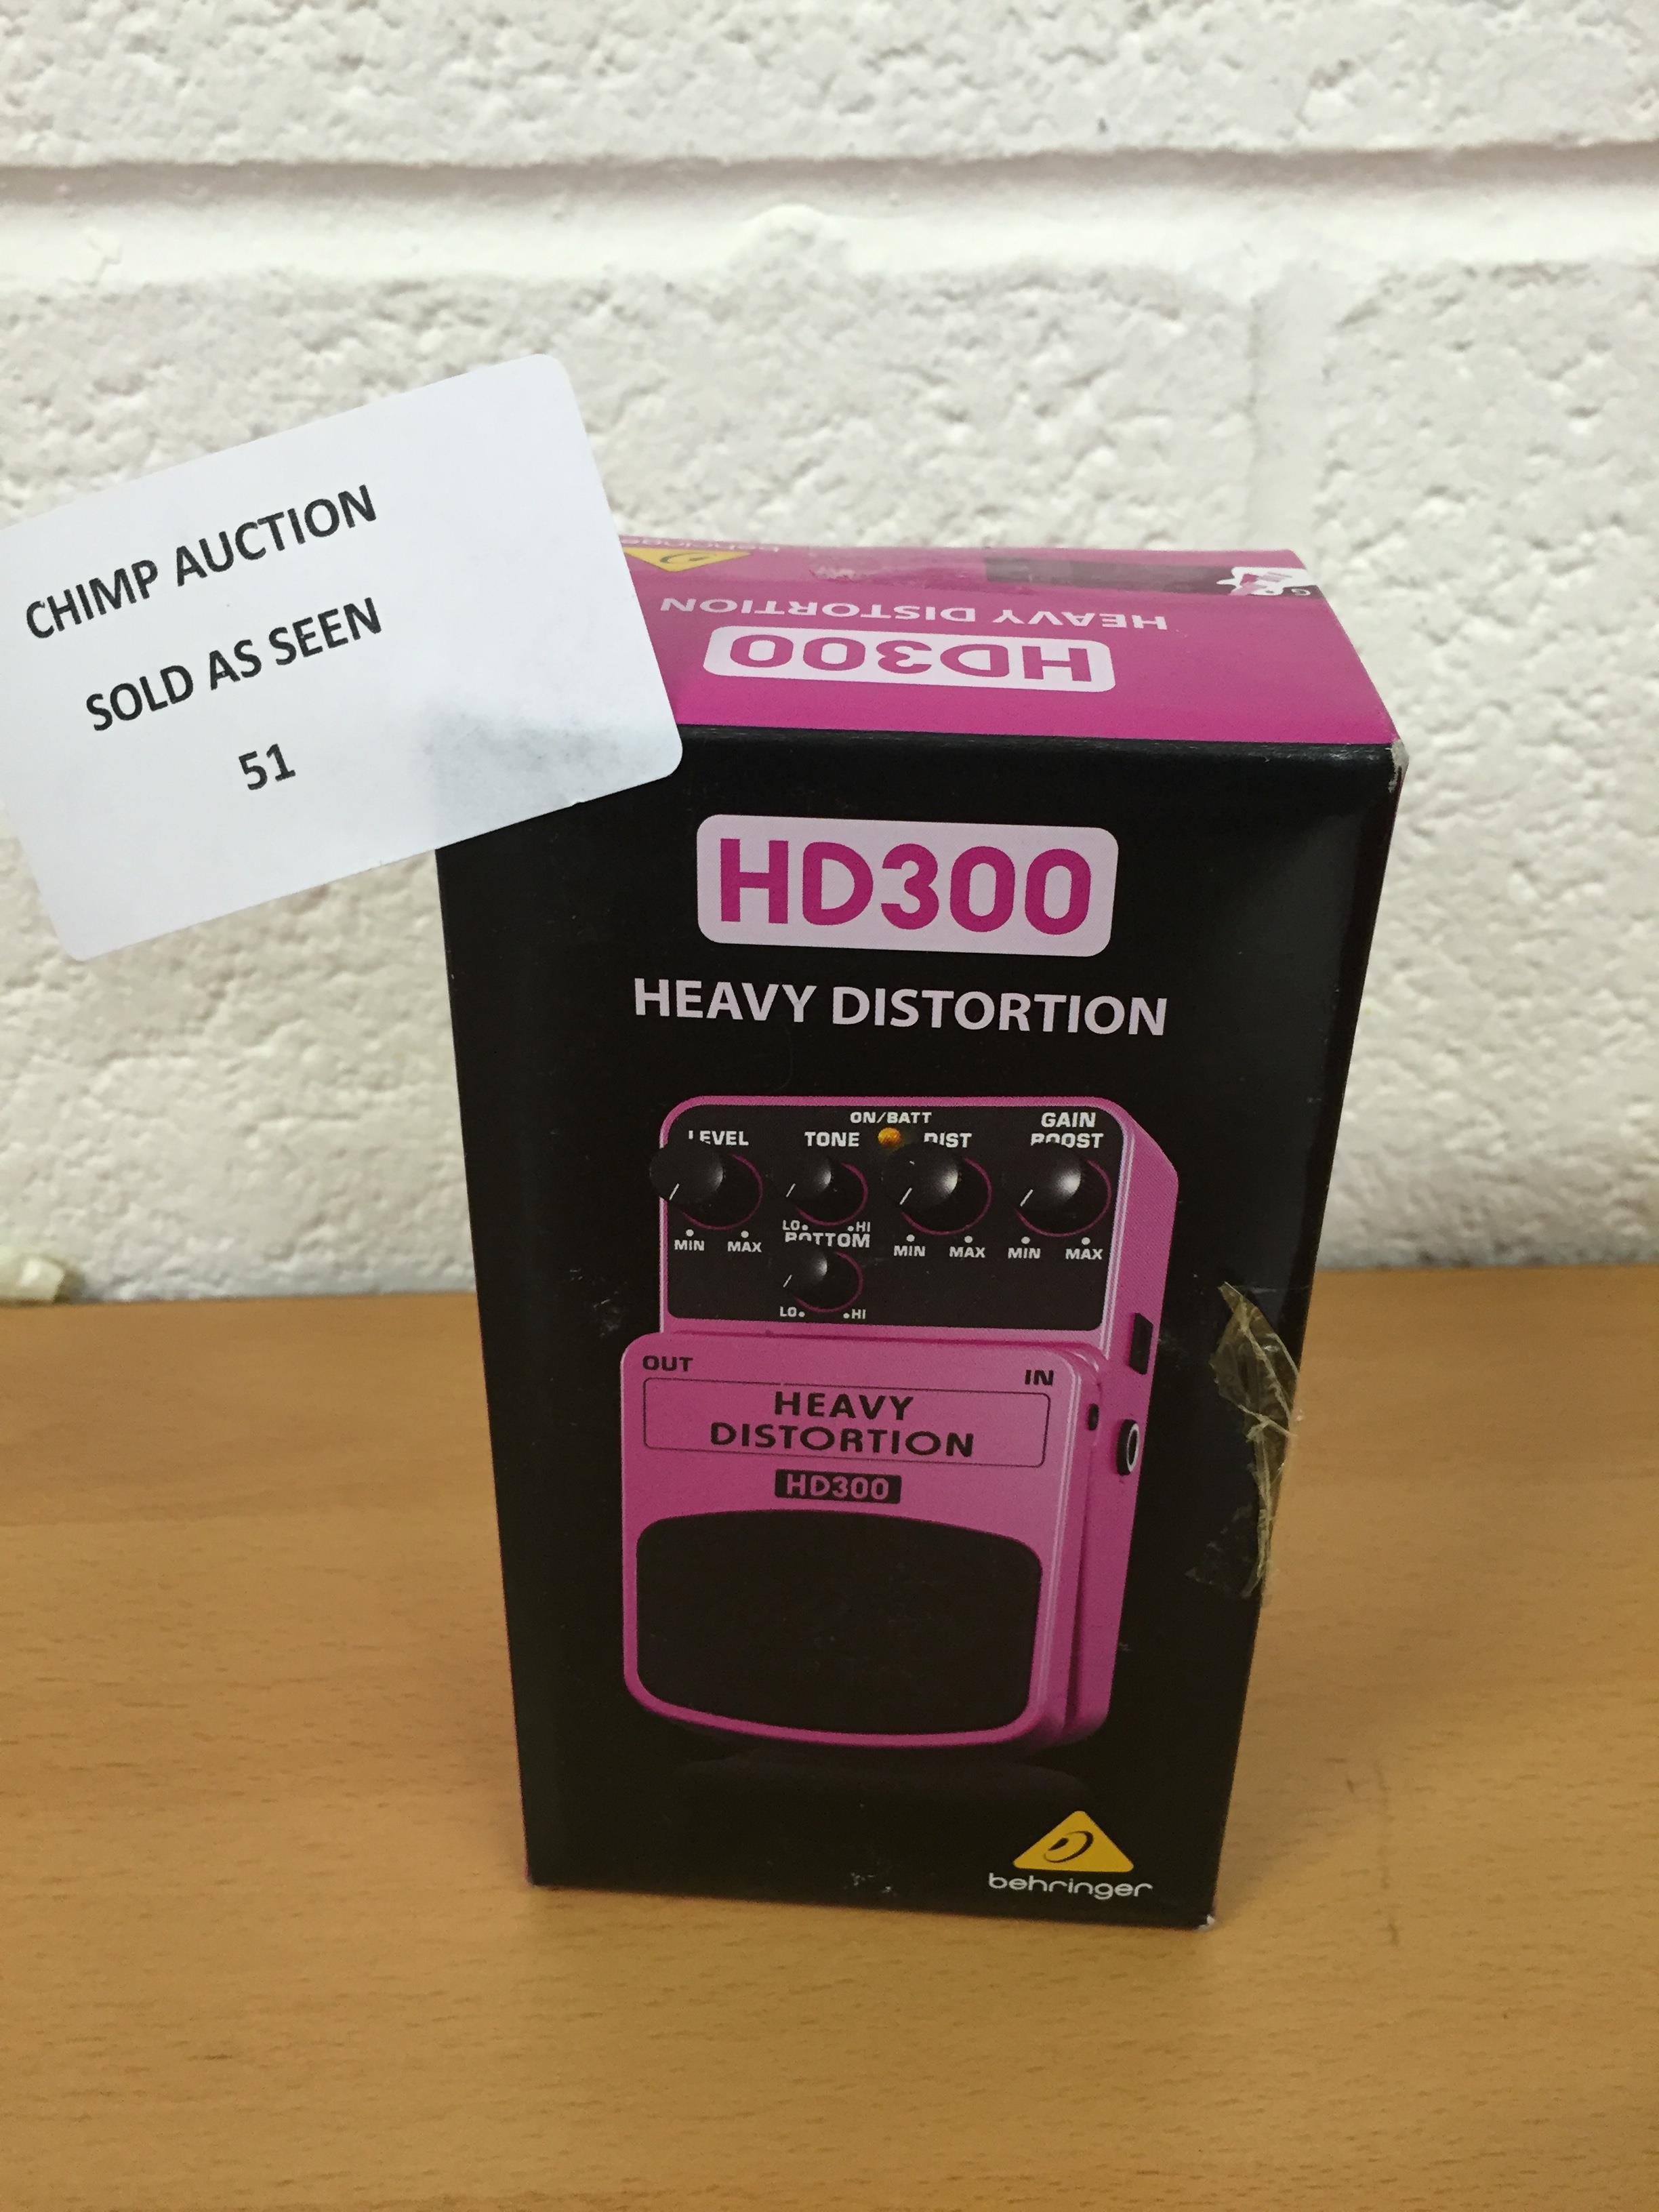 Lot 51 - Behringer HD-300 Heavy Distortion